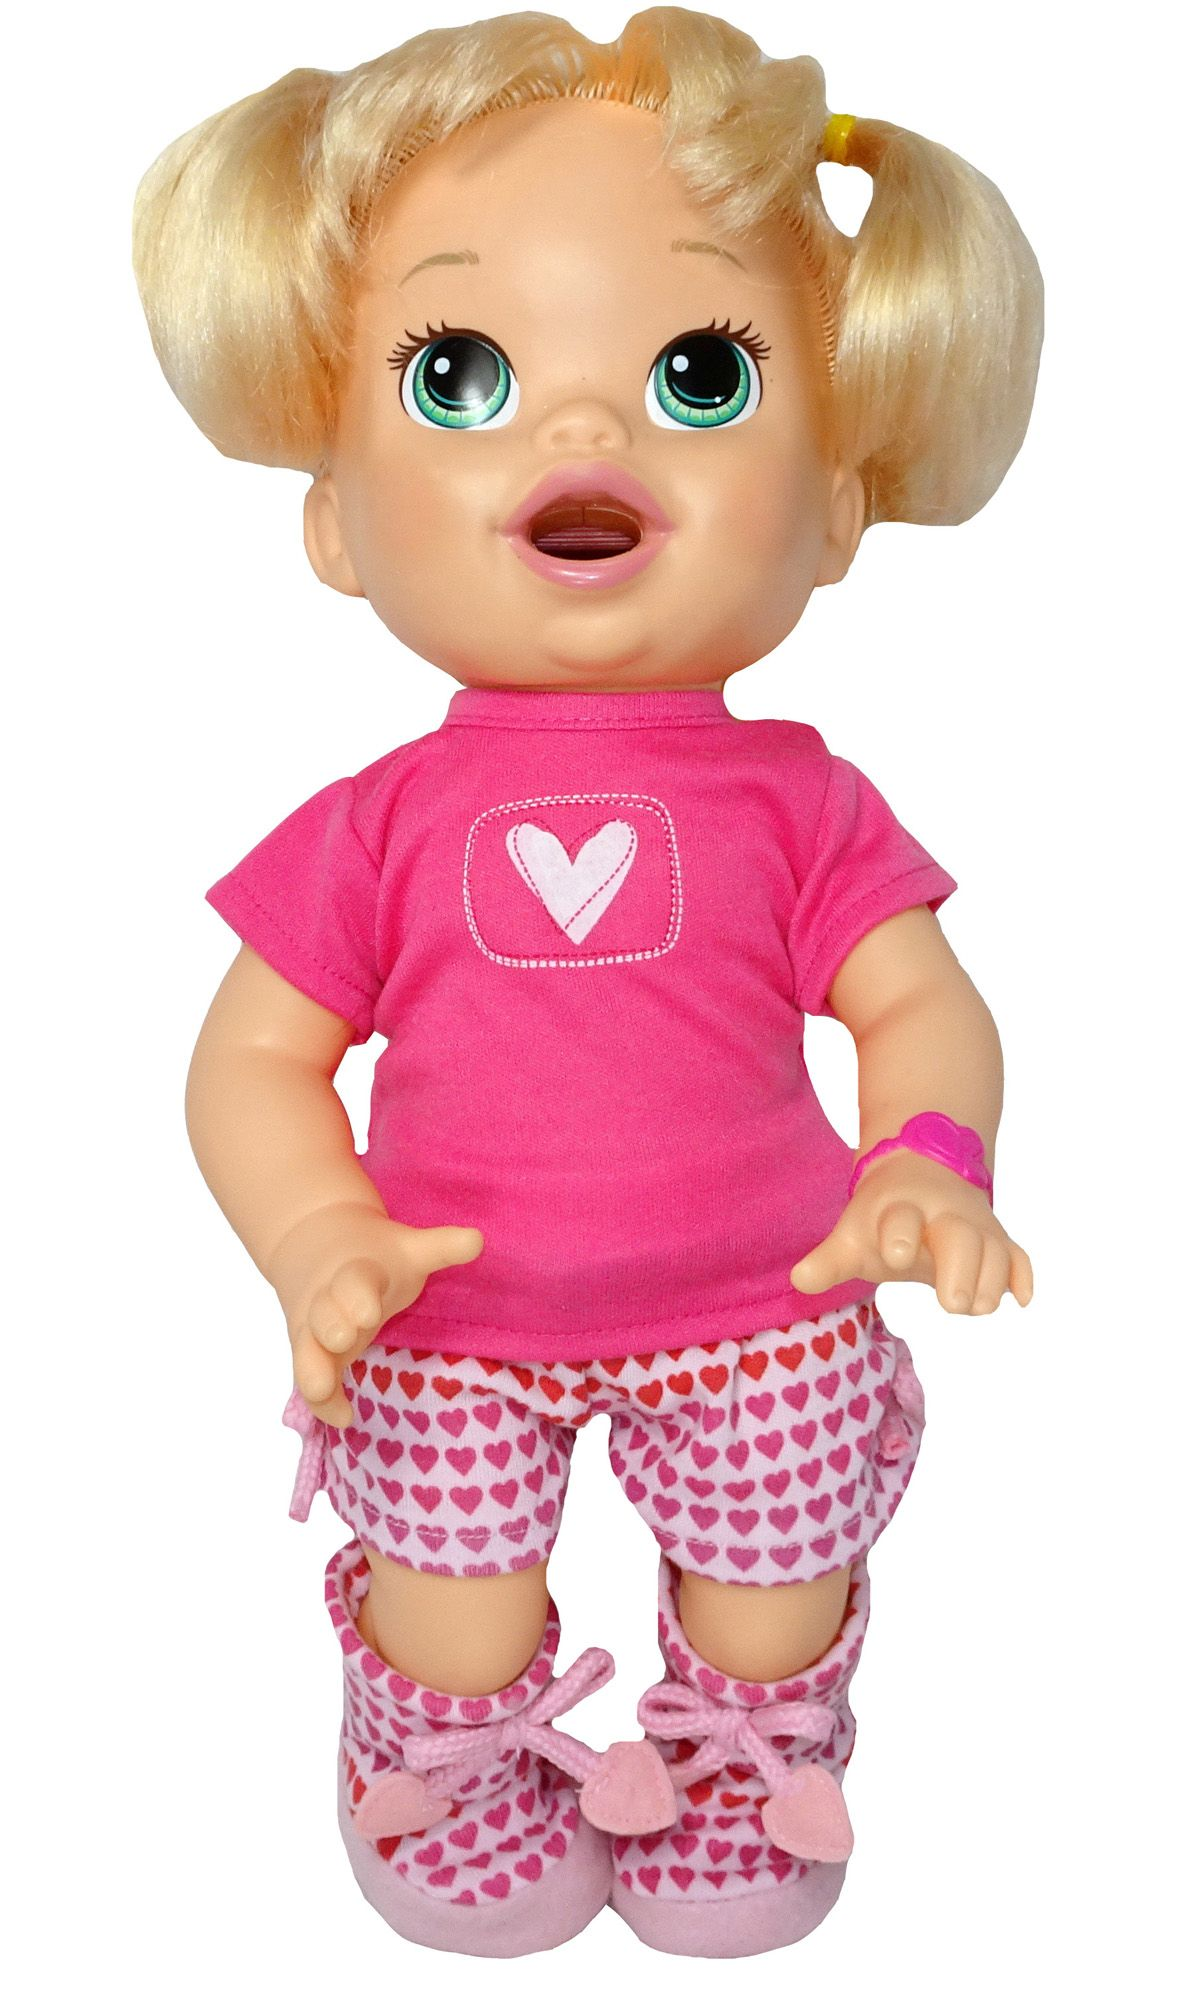 Pink Heart Pyjama Set Baby alive dolls, Girl doll